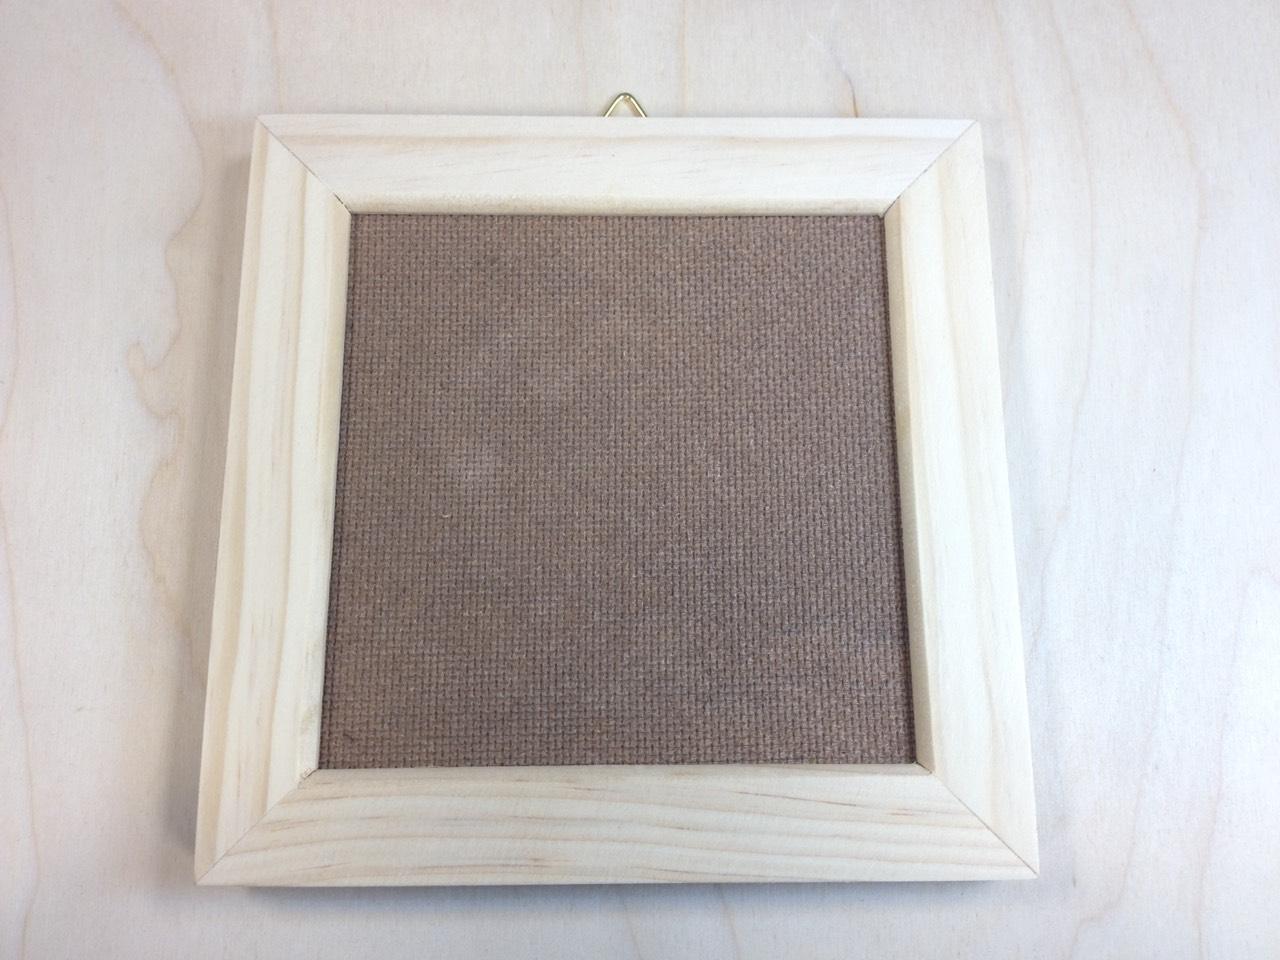 DIY手作材料-15*15cm 原木相框